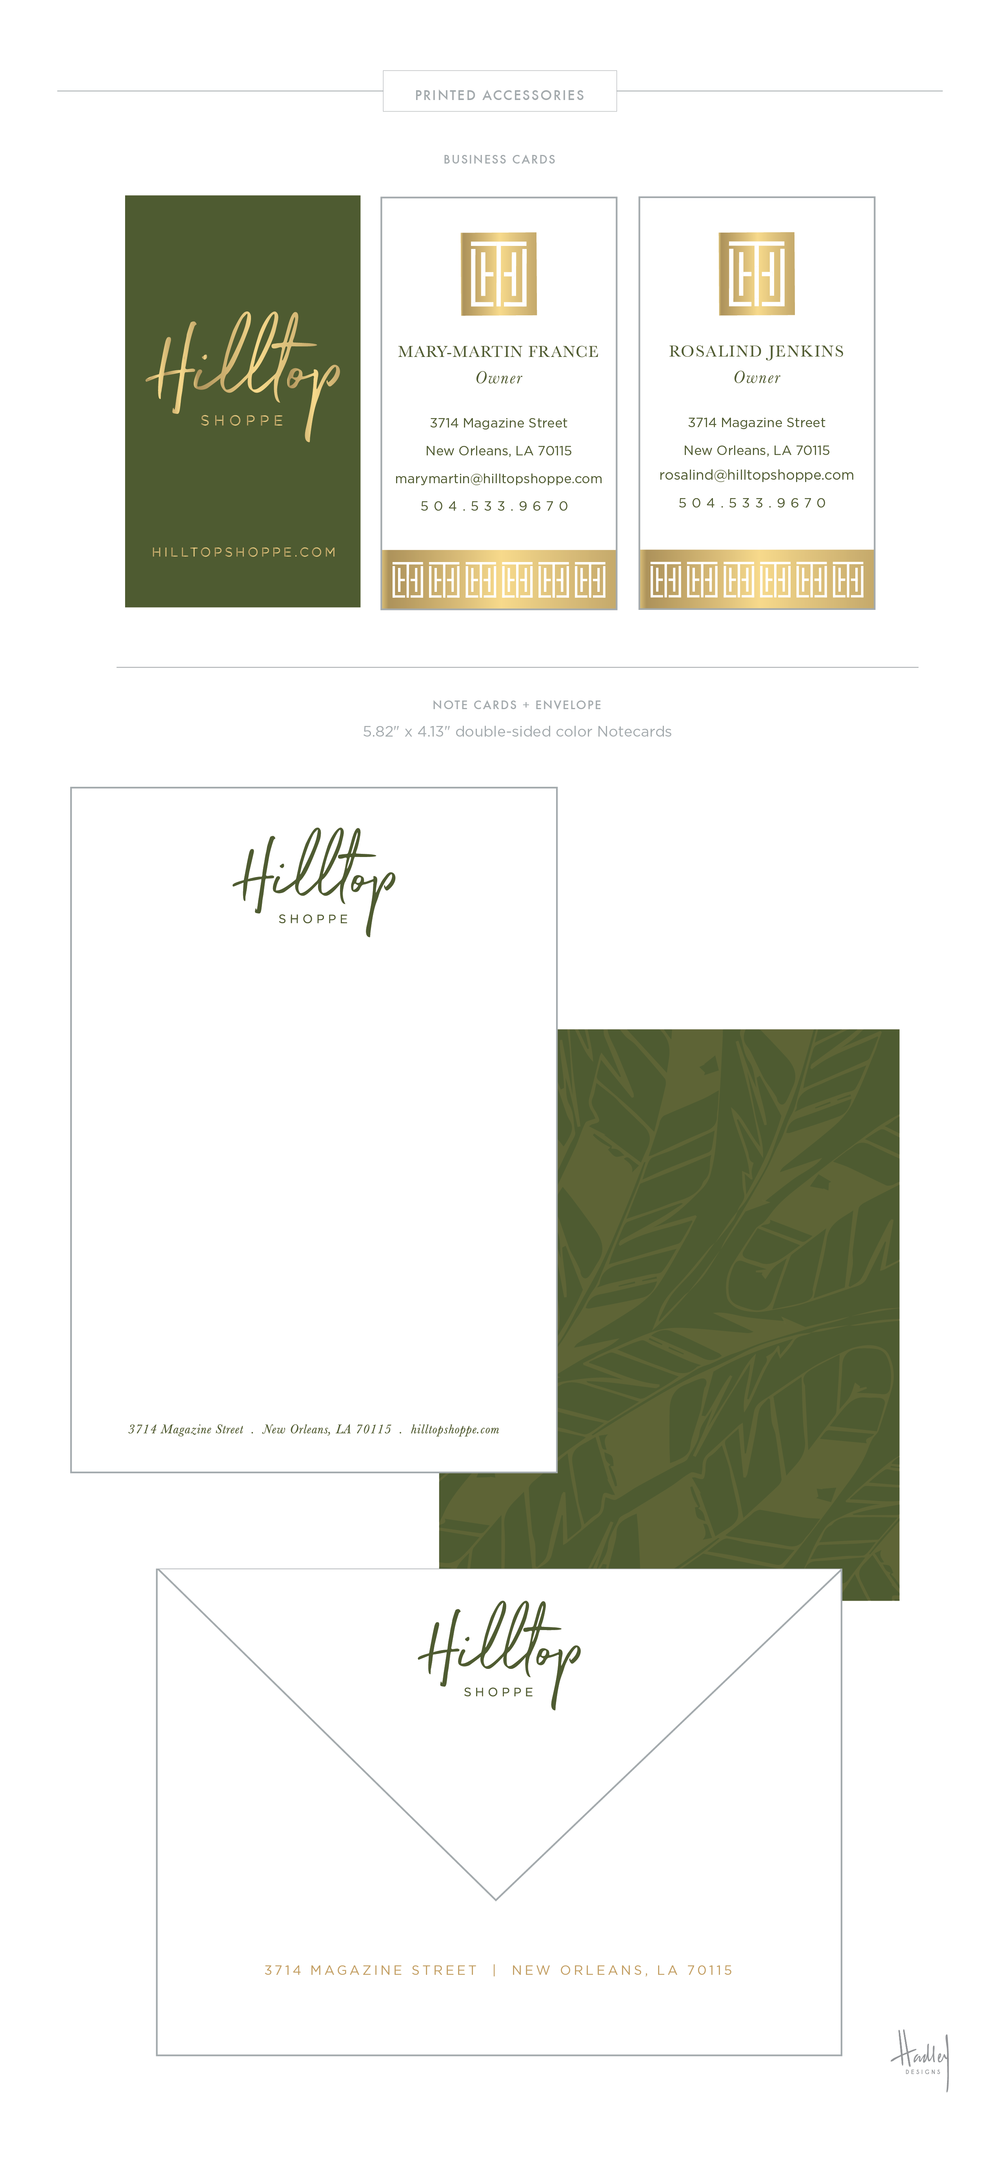 Hilltop_PrintedAccessories_v4.png